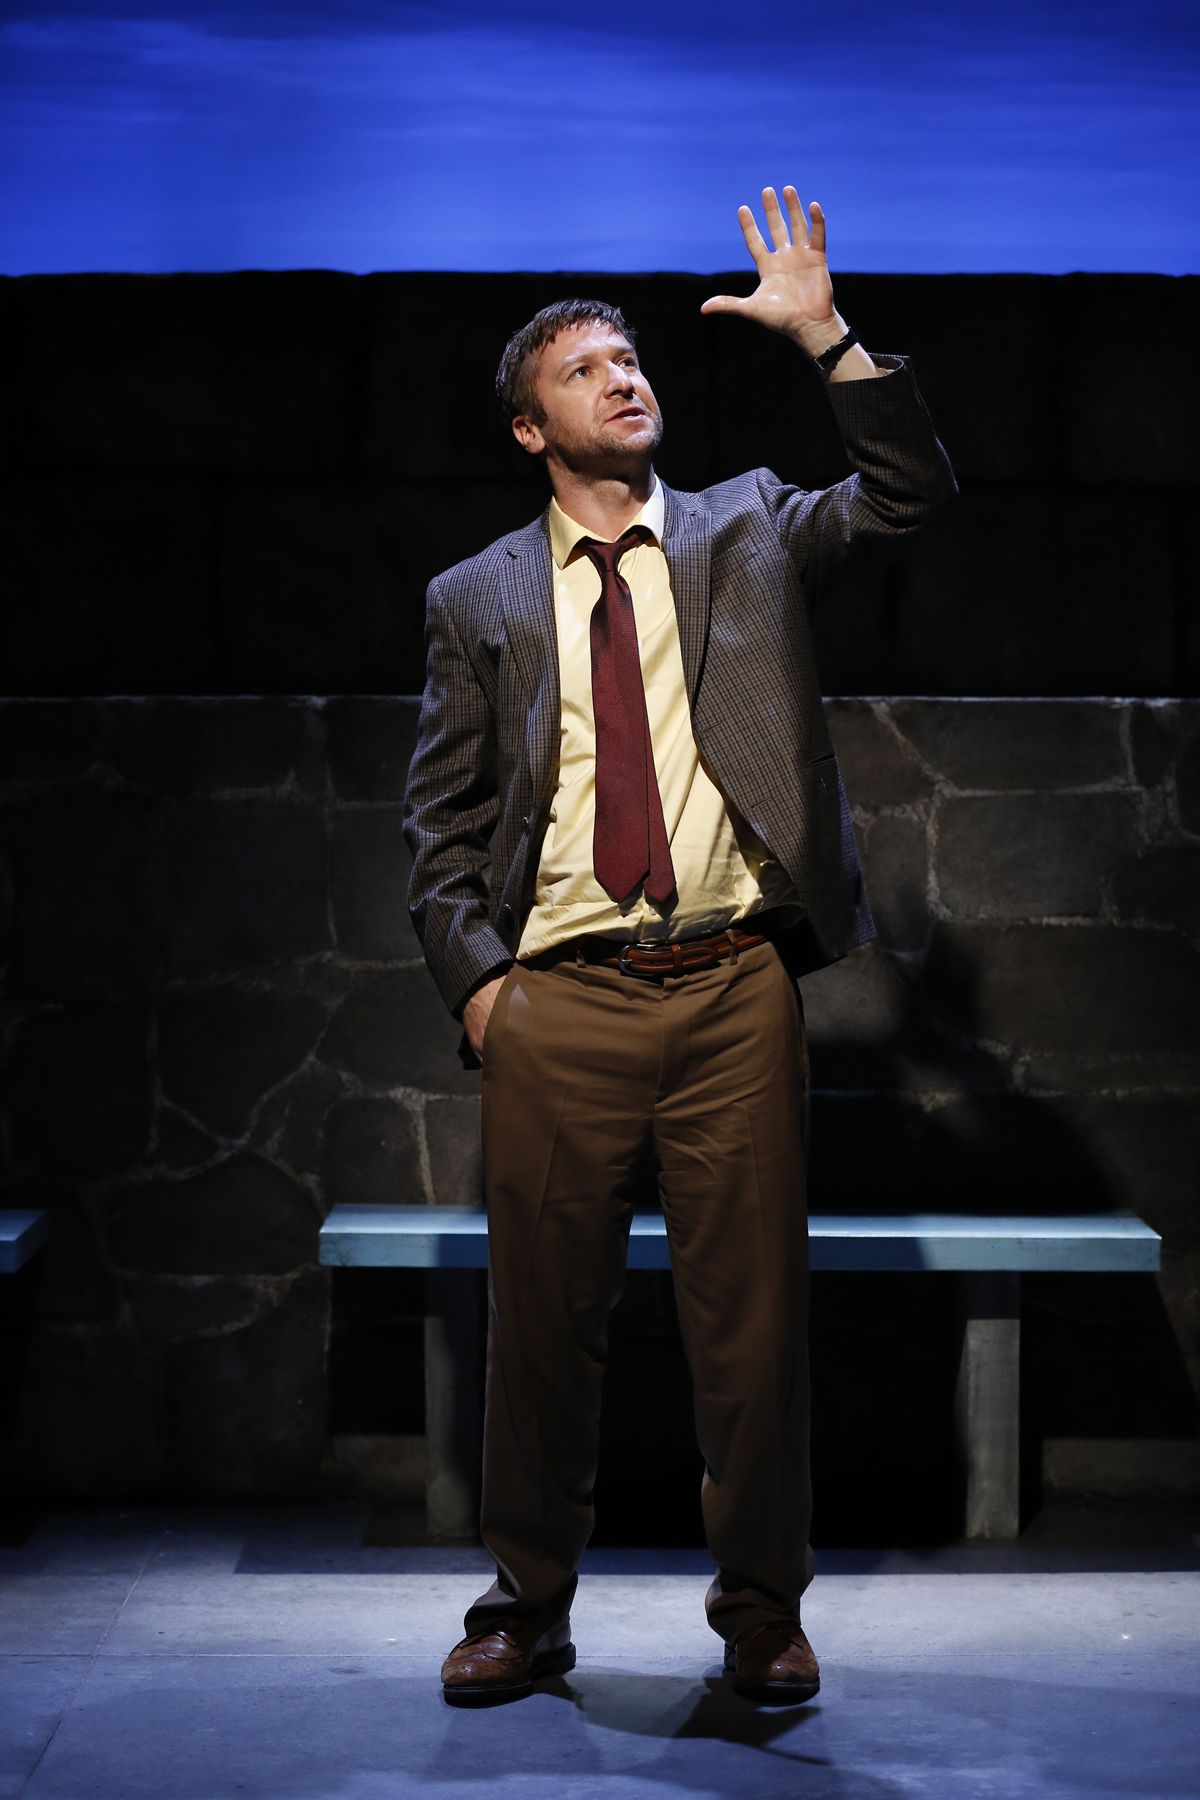 Billy Carter as Dermot in PORT AUTHORITY